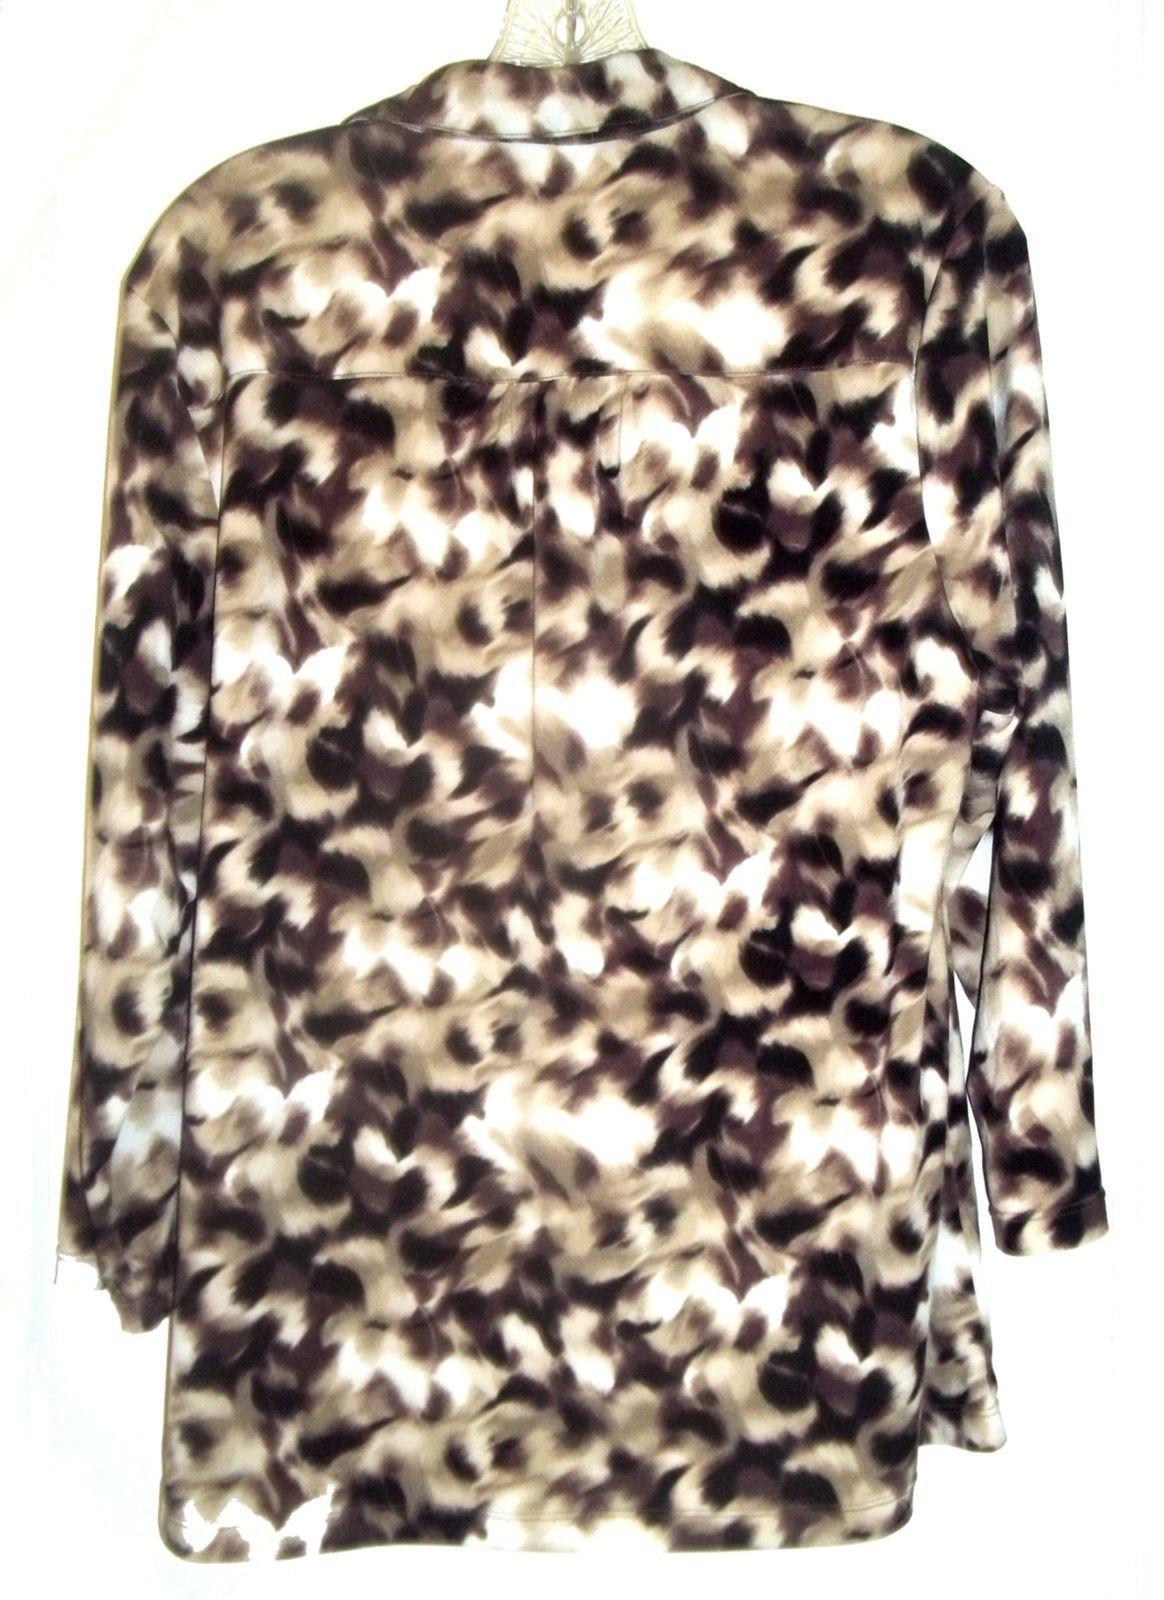 Alfani Black Brown Tan and White Mottled Print Top Polyester Blend Size XL